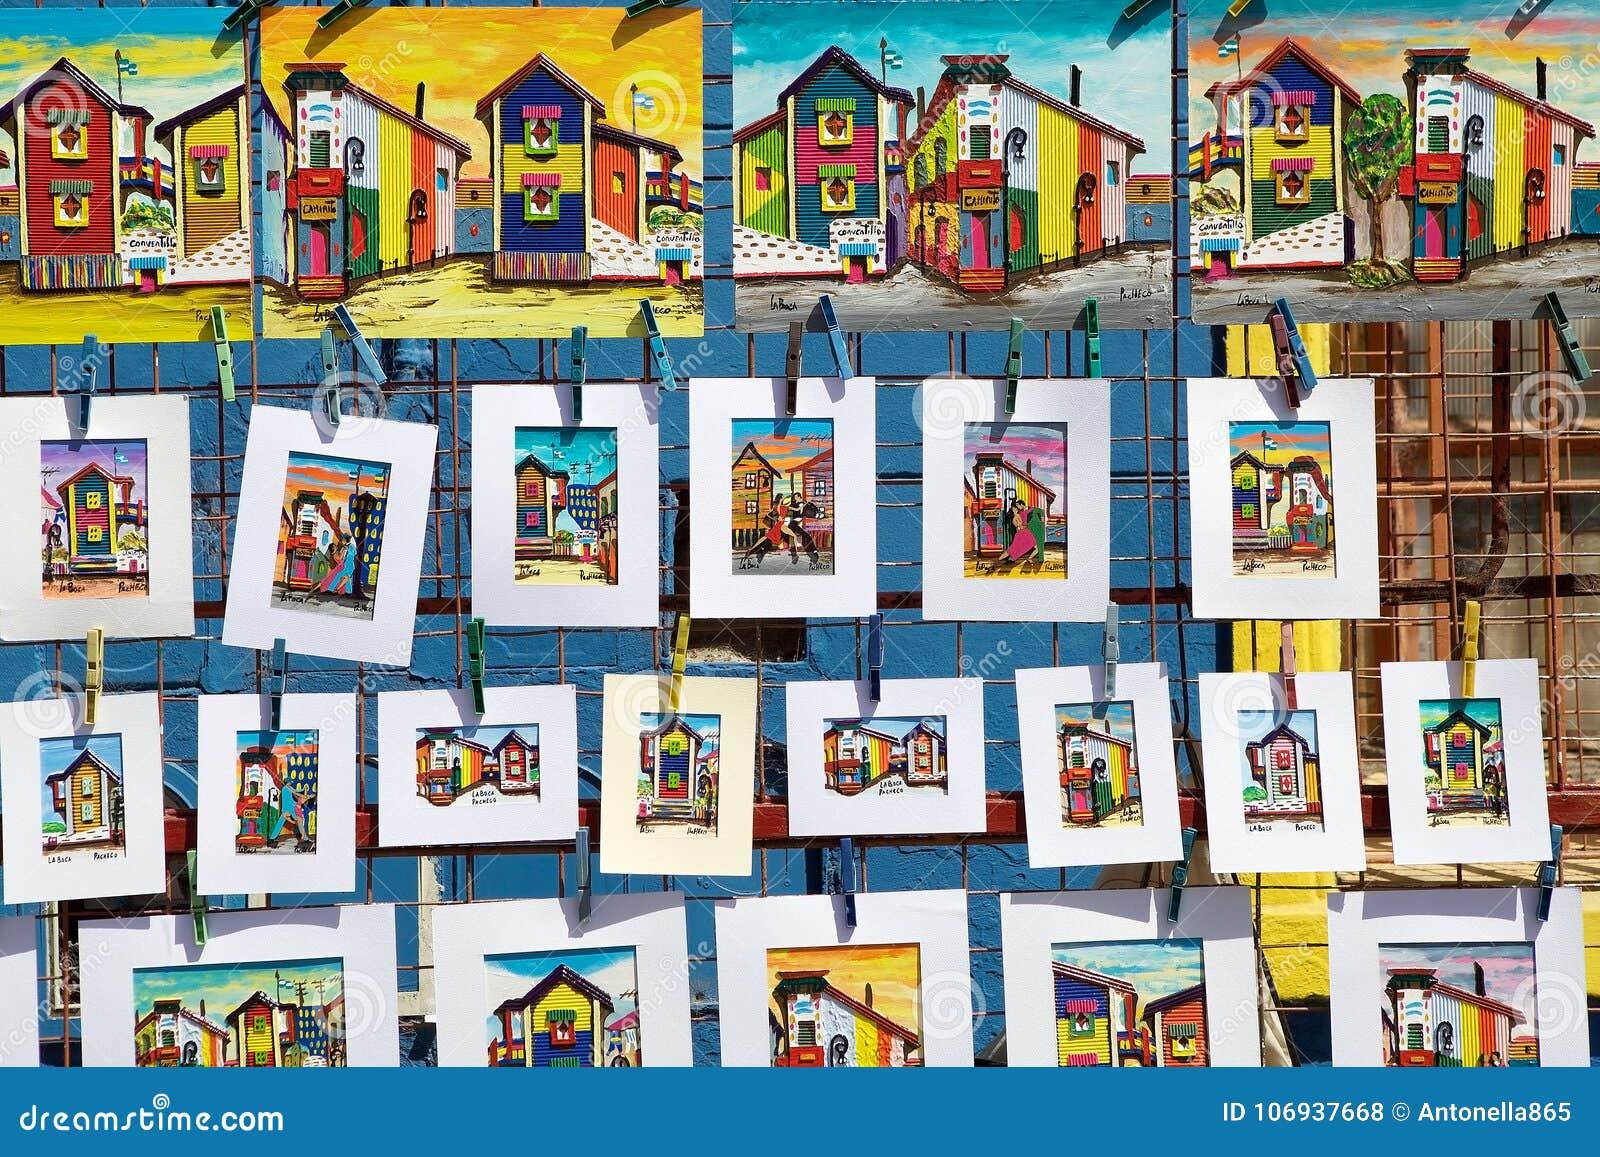 Paintings at La Boca, Buenos Aires, Argentina